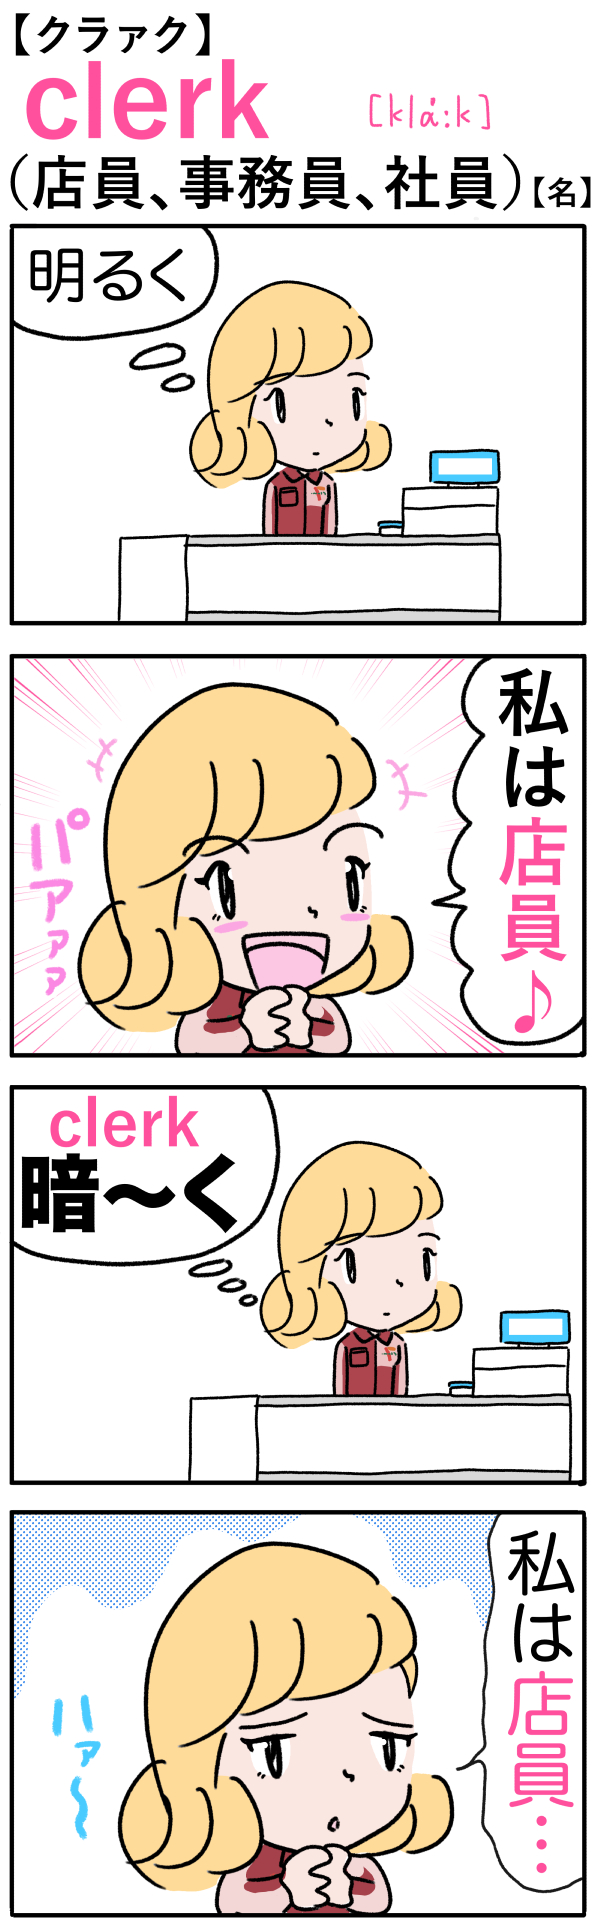 clerk(店員、事務員)の語呂合わせ英単語